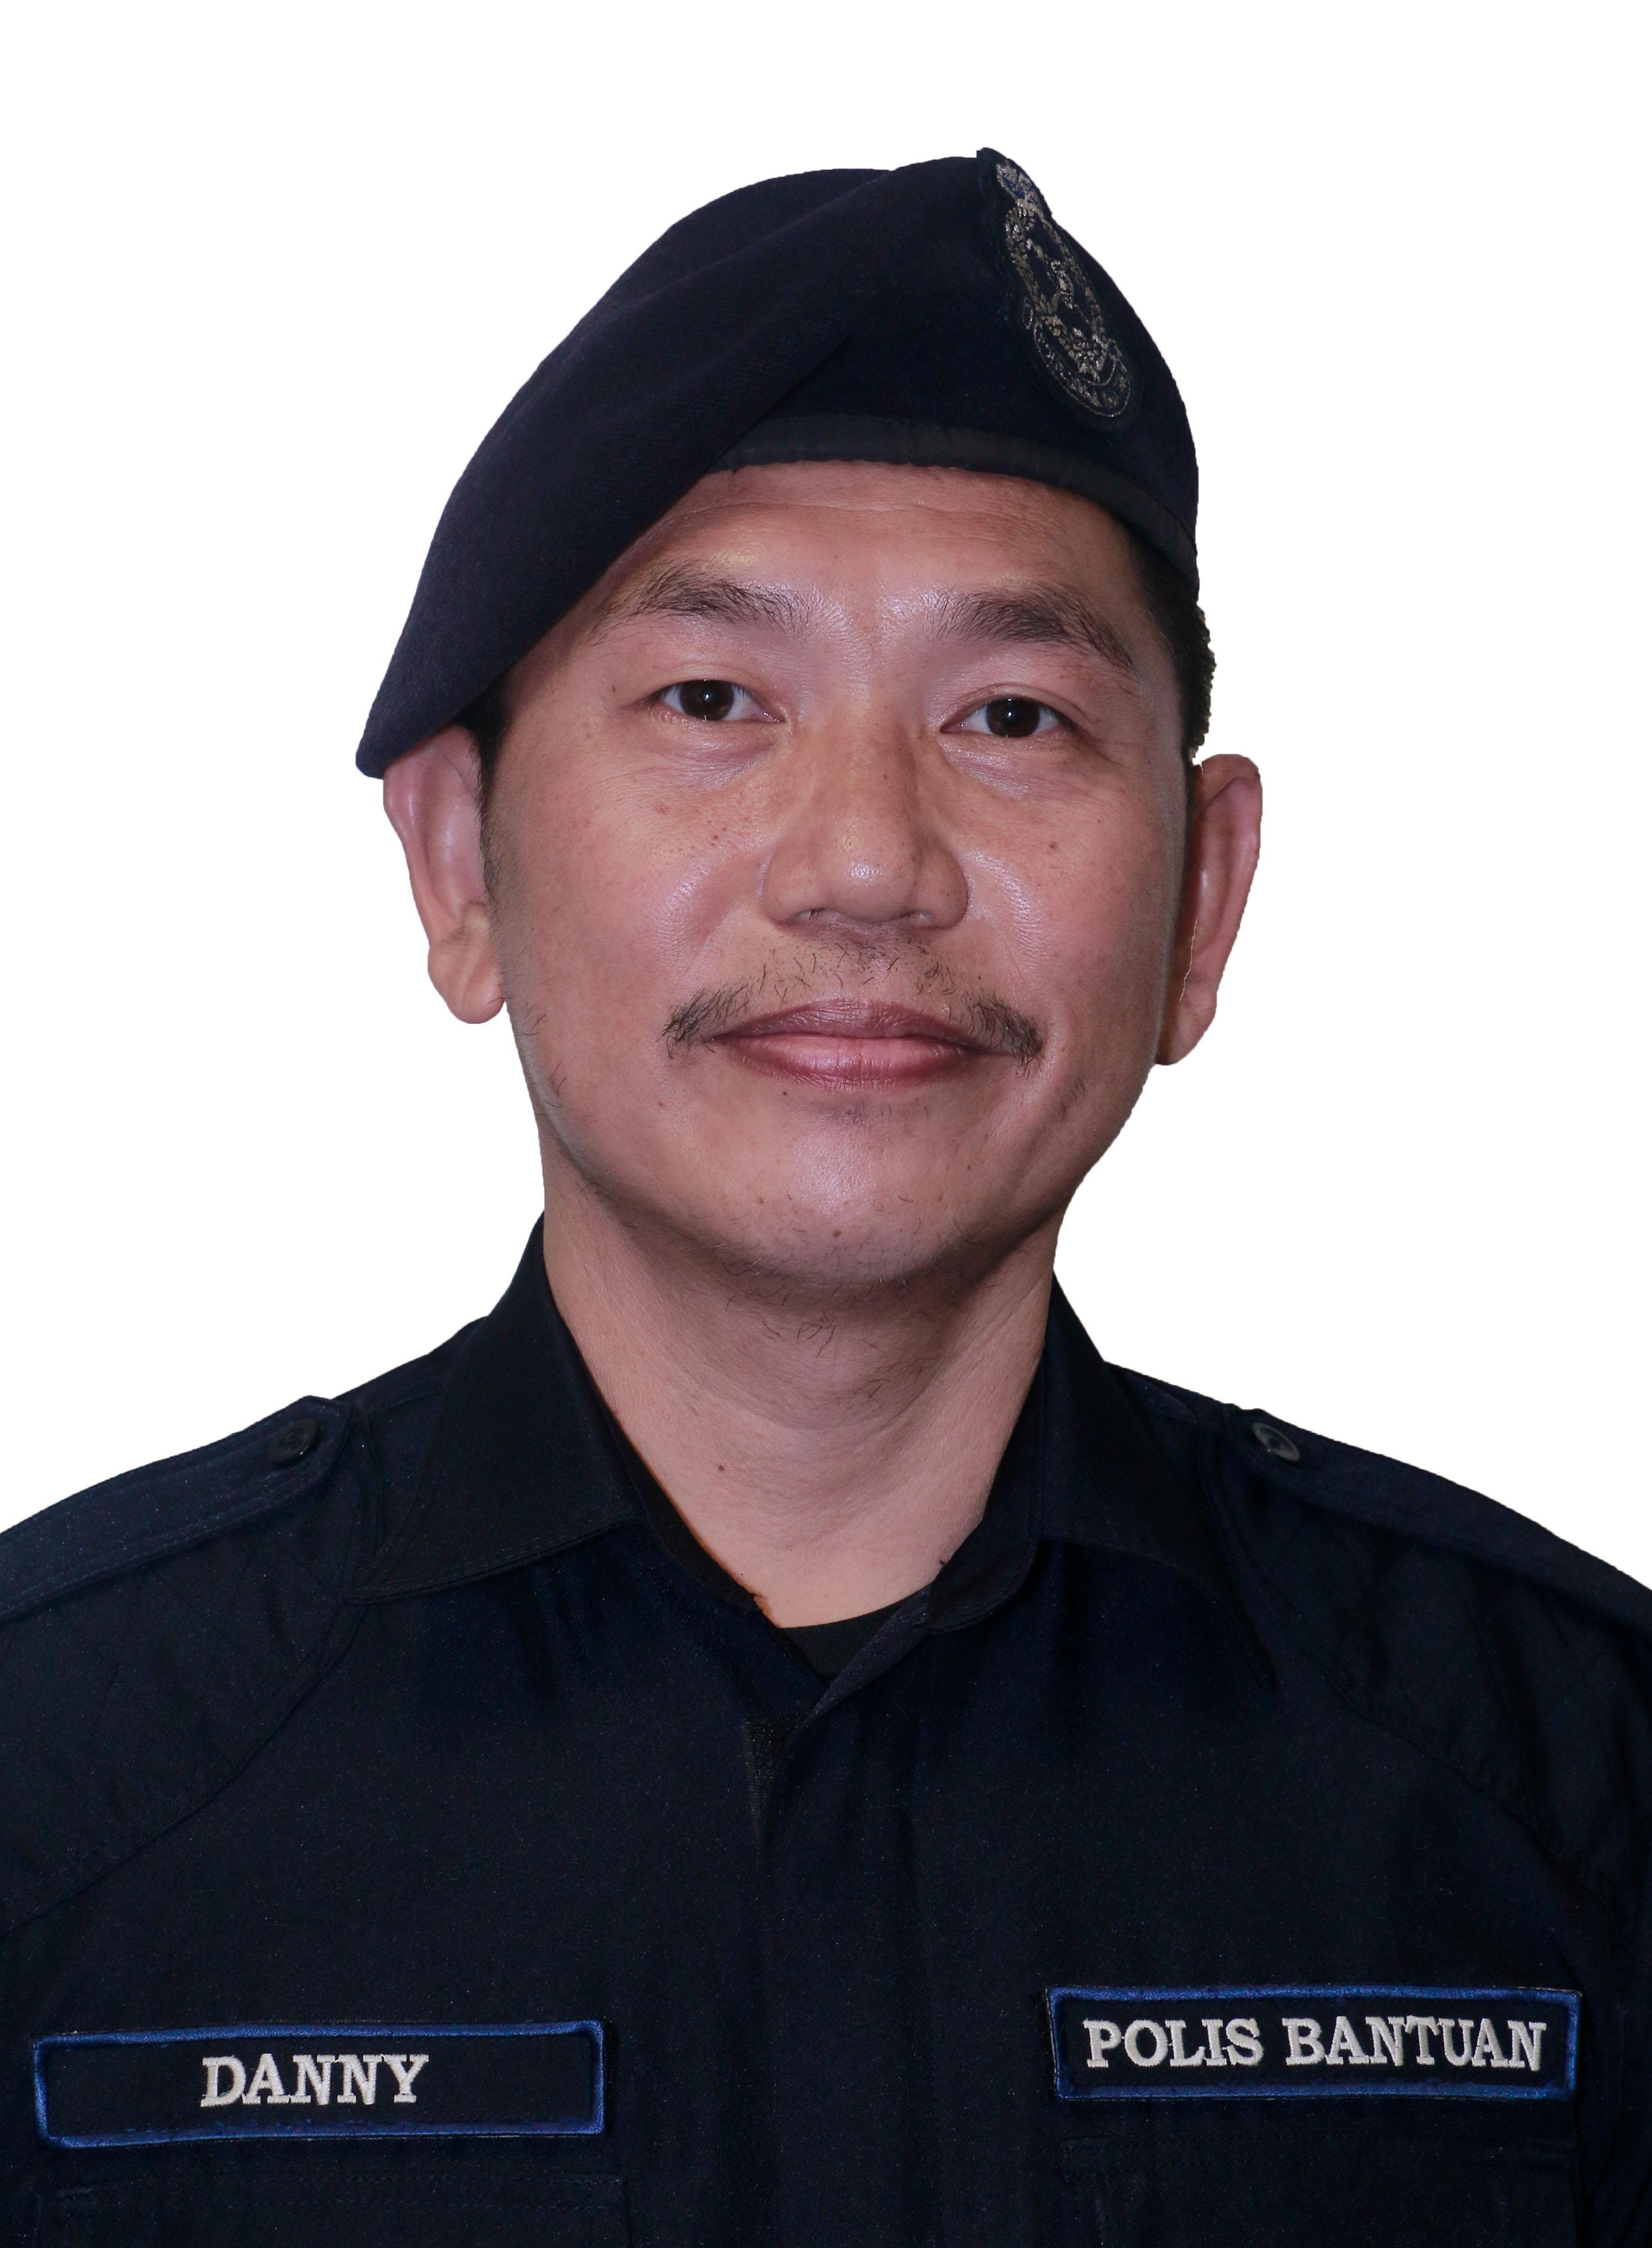 Cpl. Danny Ong Ing Kwang